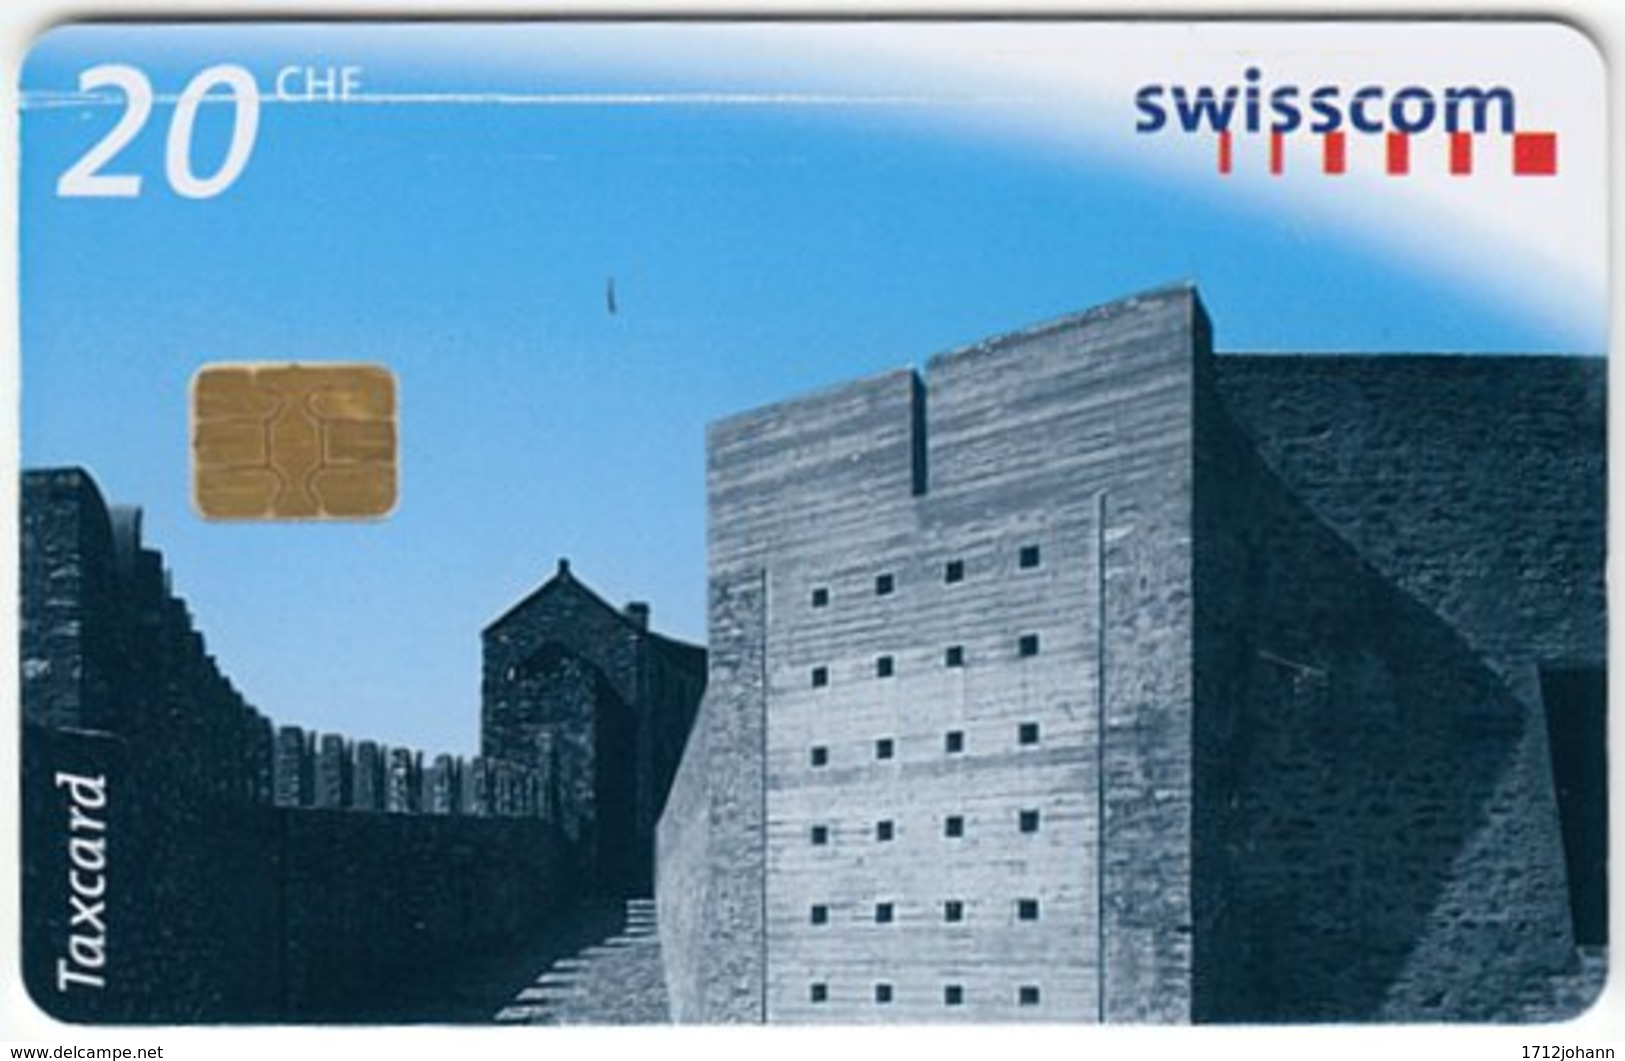 SWITZERLAND C-317 Chip Swisscom - Architecture, Modern Building - Used - Switzerland